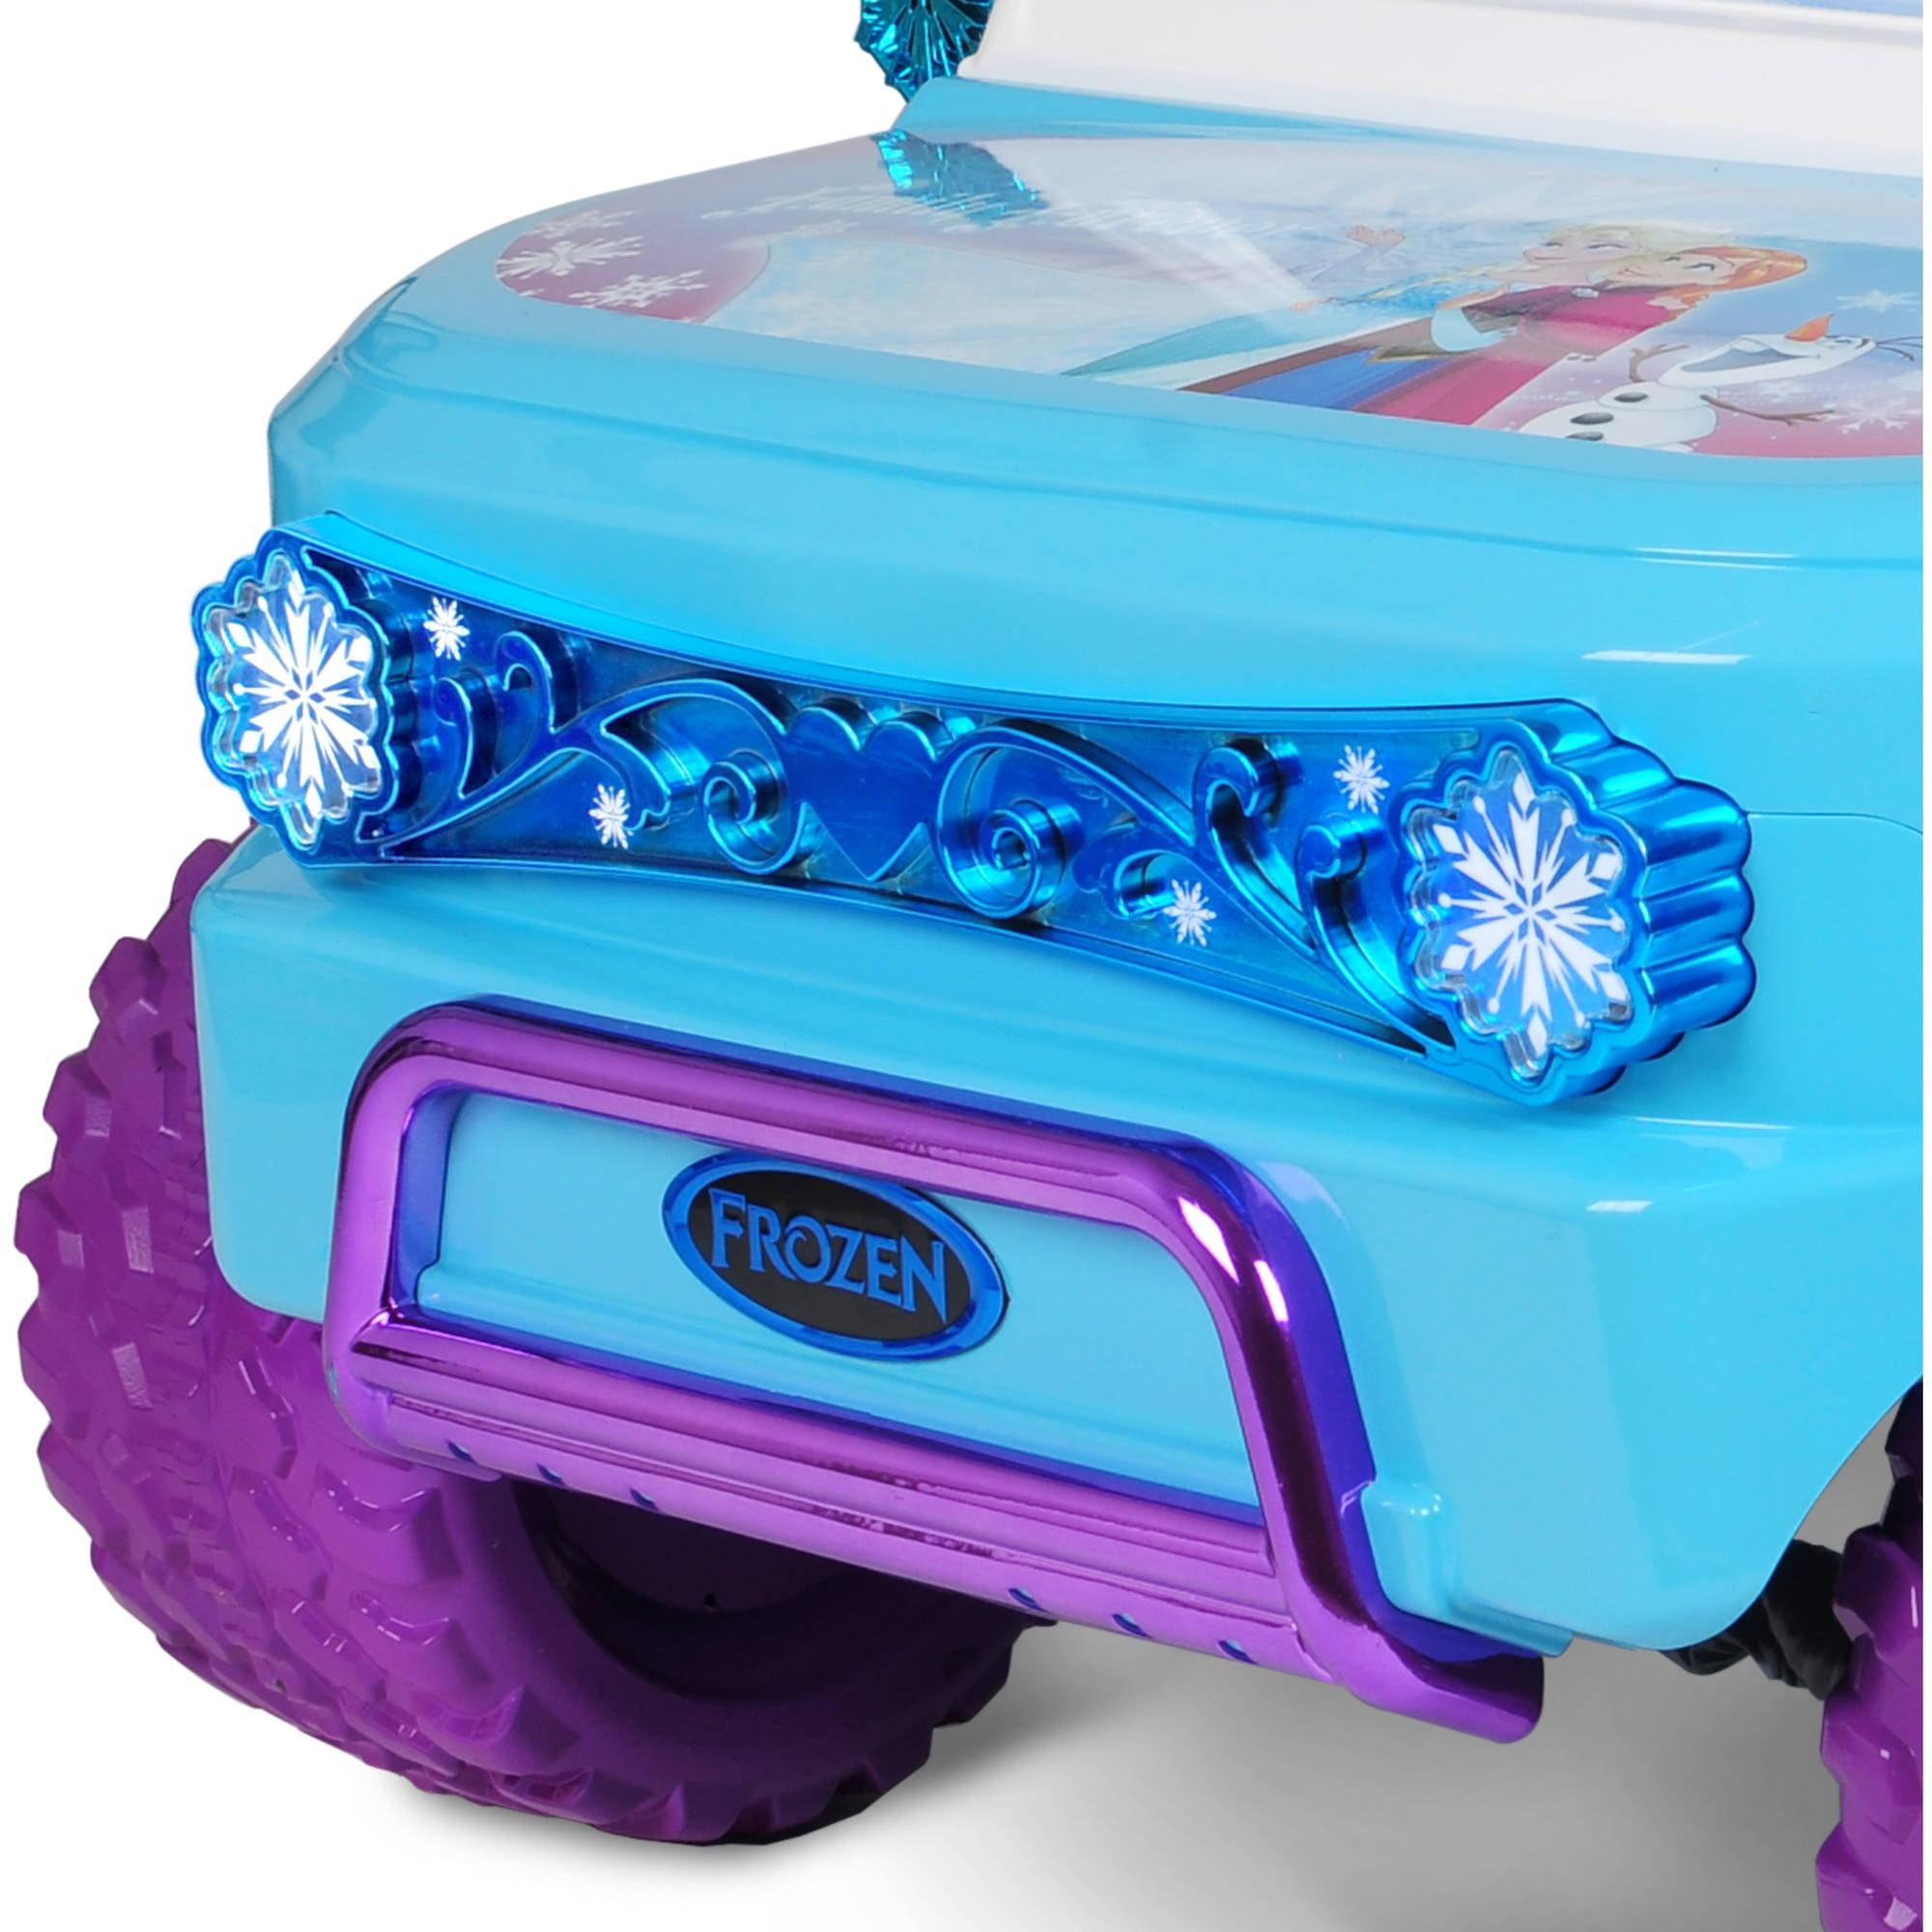 Disney Frozen SUV 12V Battery-Operated Ride-On - Walmart.com